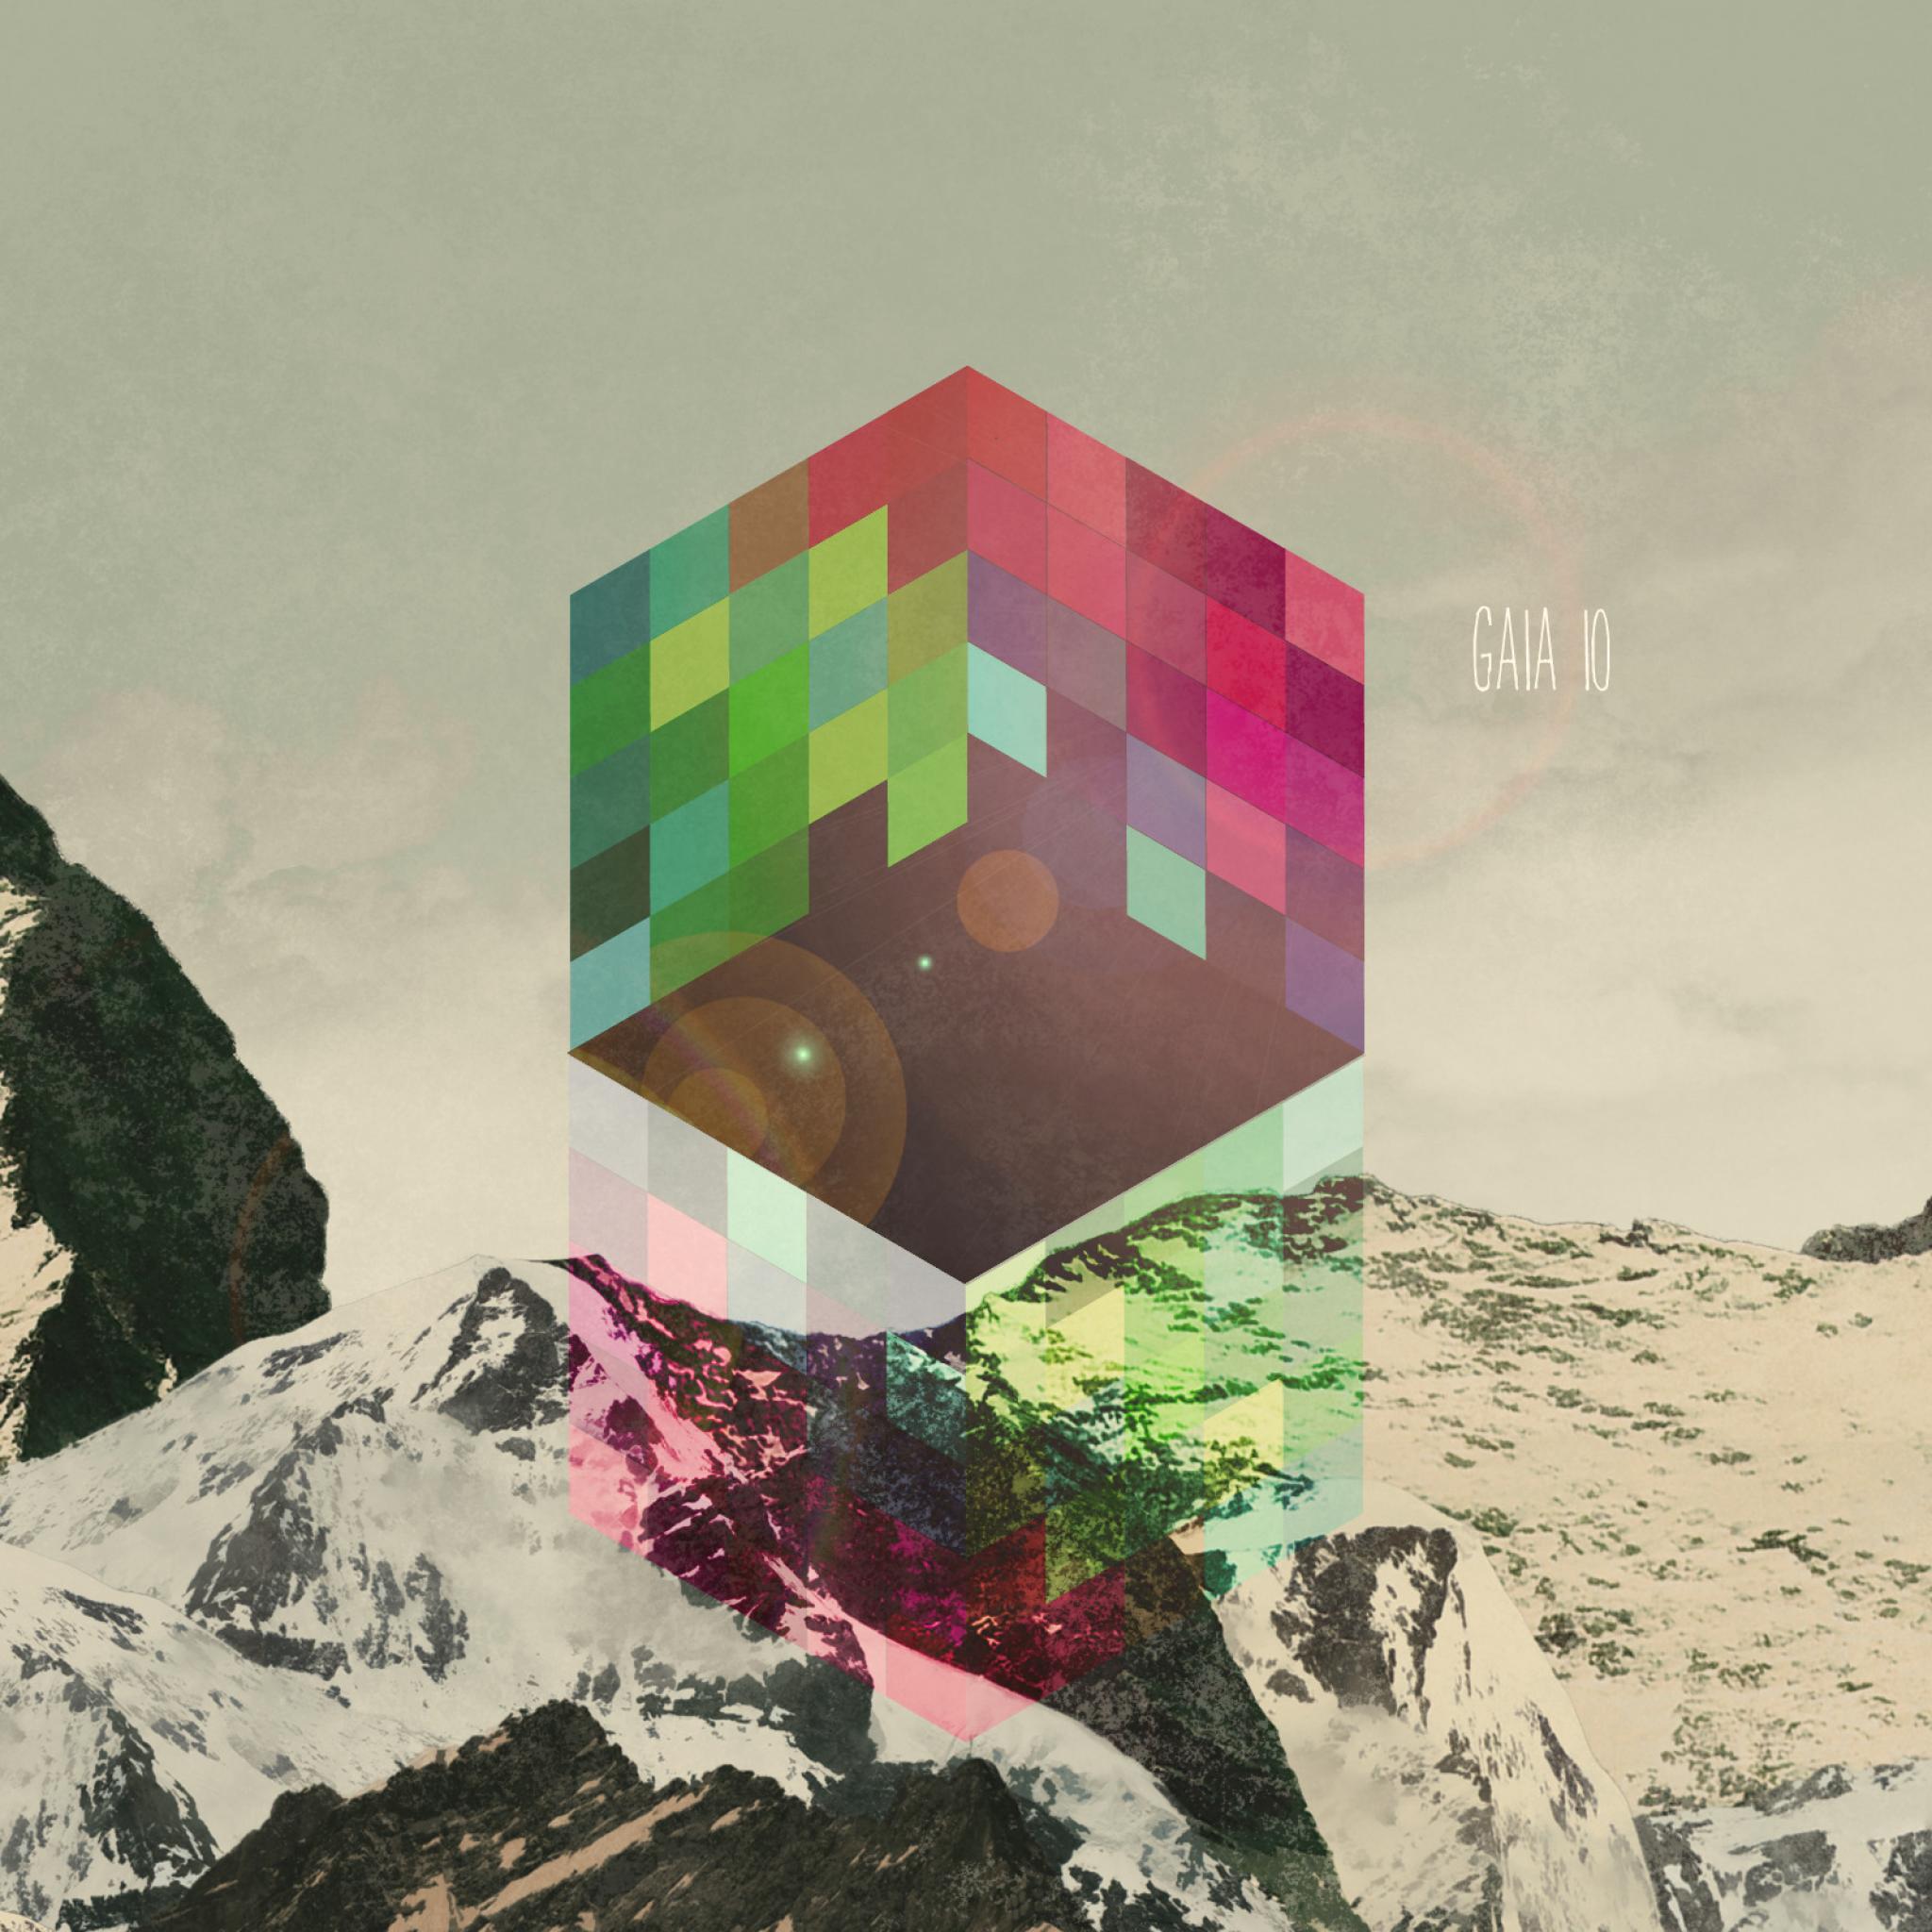 Abstraction-Cube-3Wallpapers-ipad-Retina